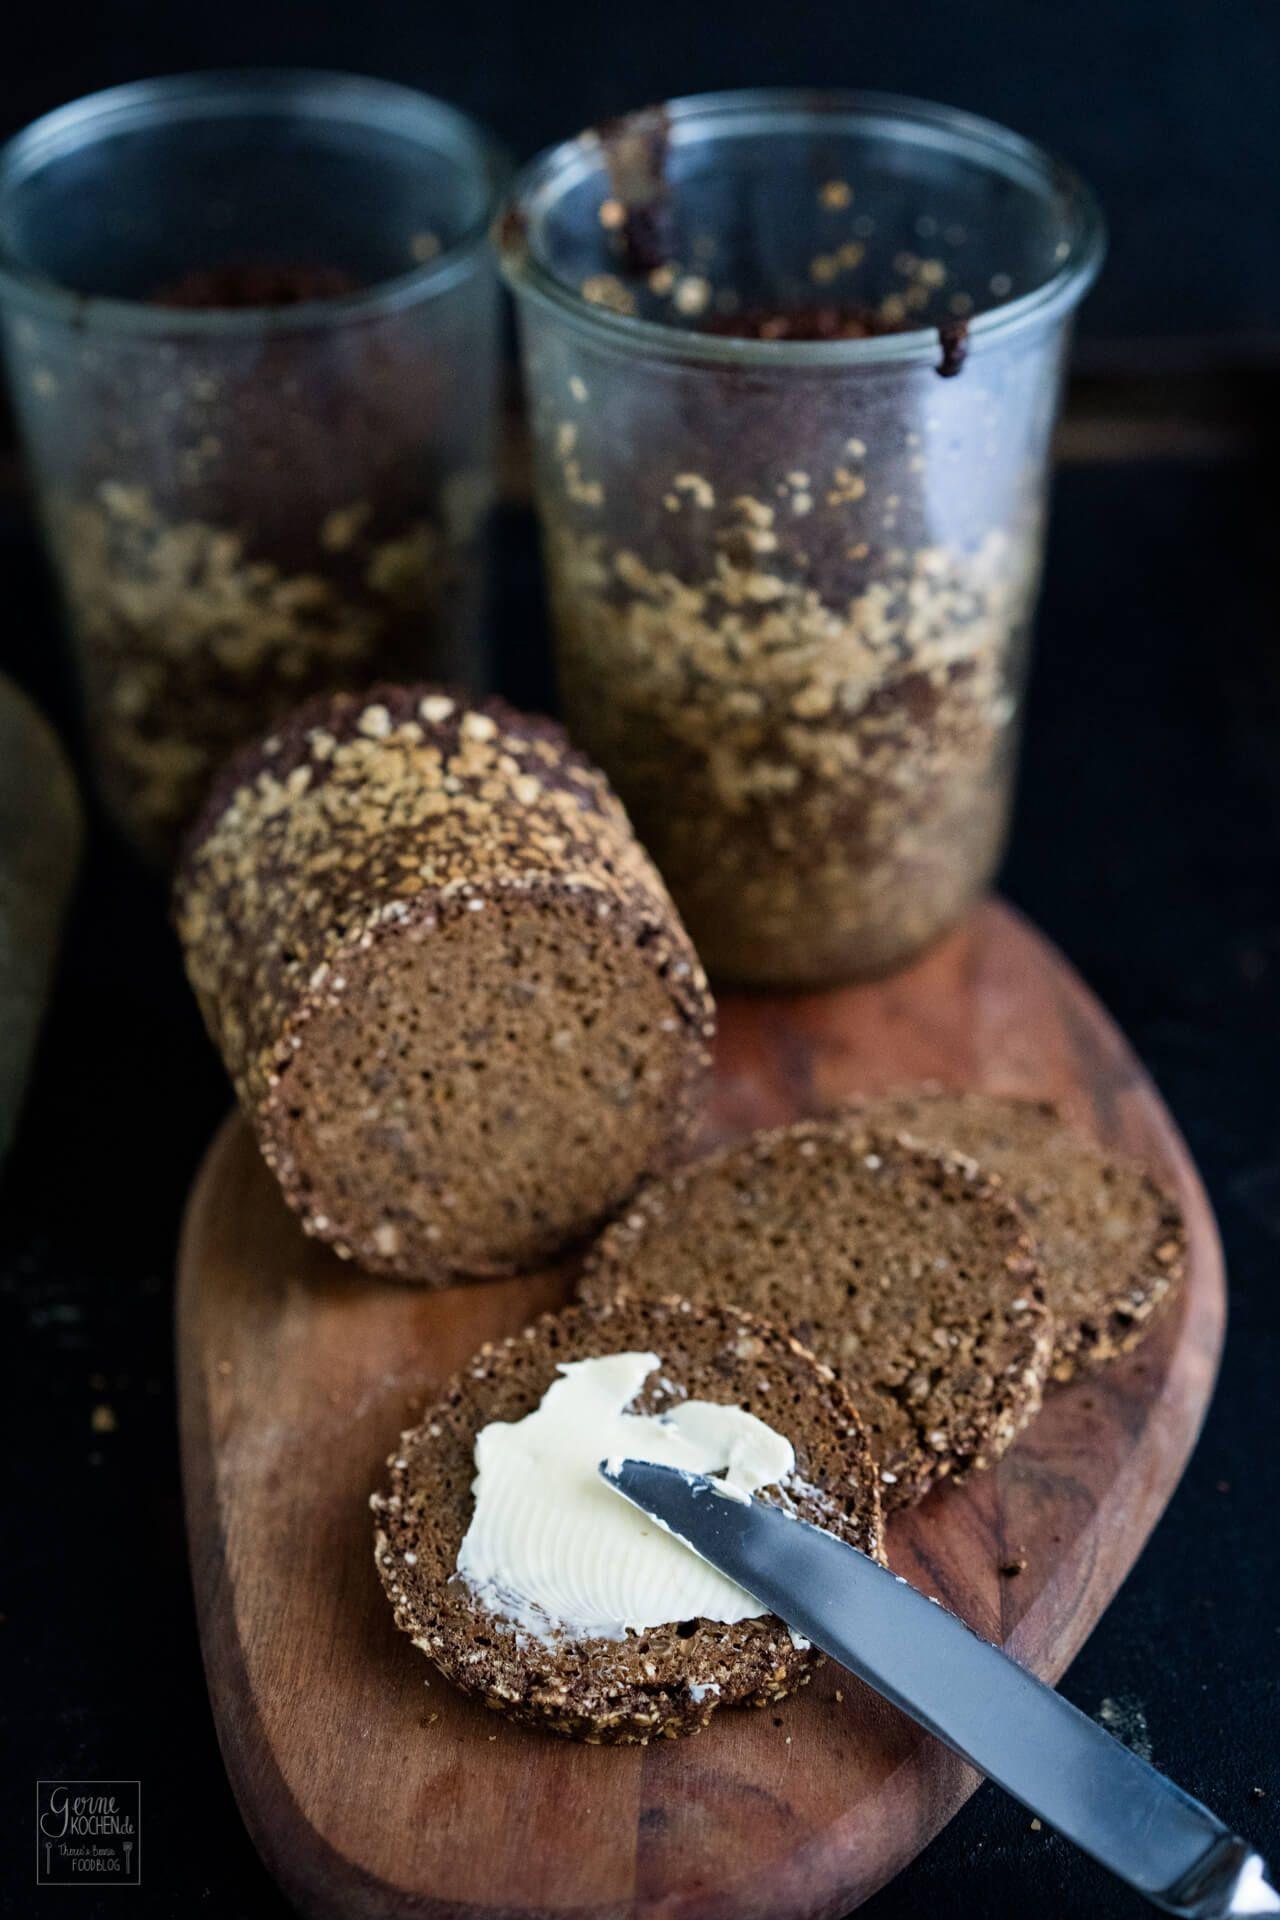 Rezept: Vollkornbrot - im Glas gebacken - Gernekochen.de